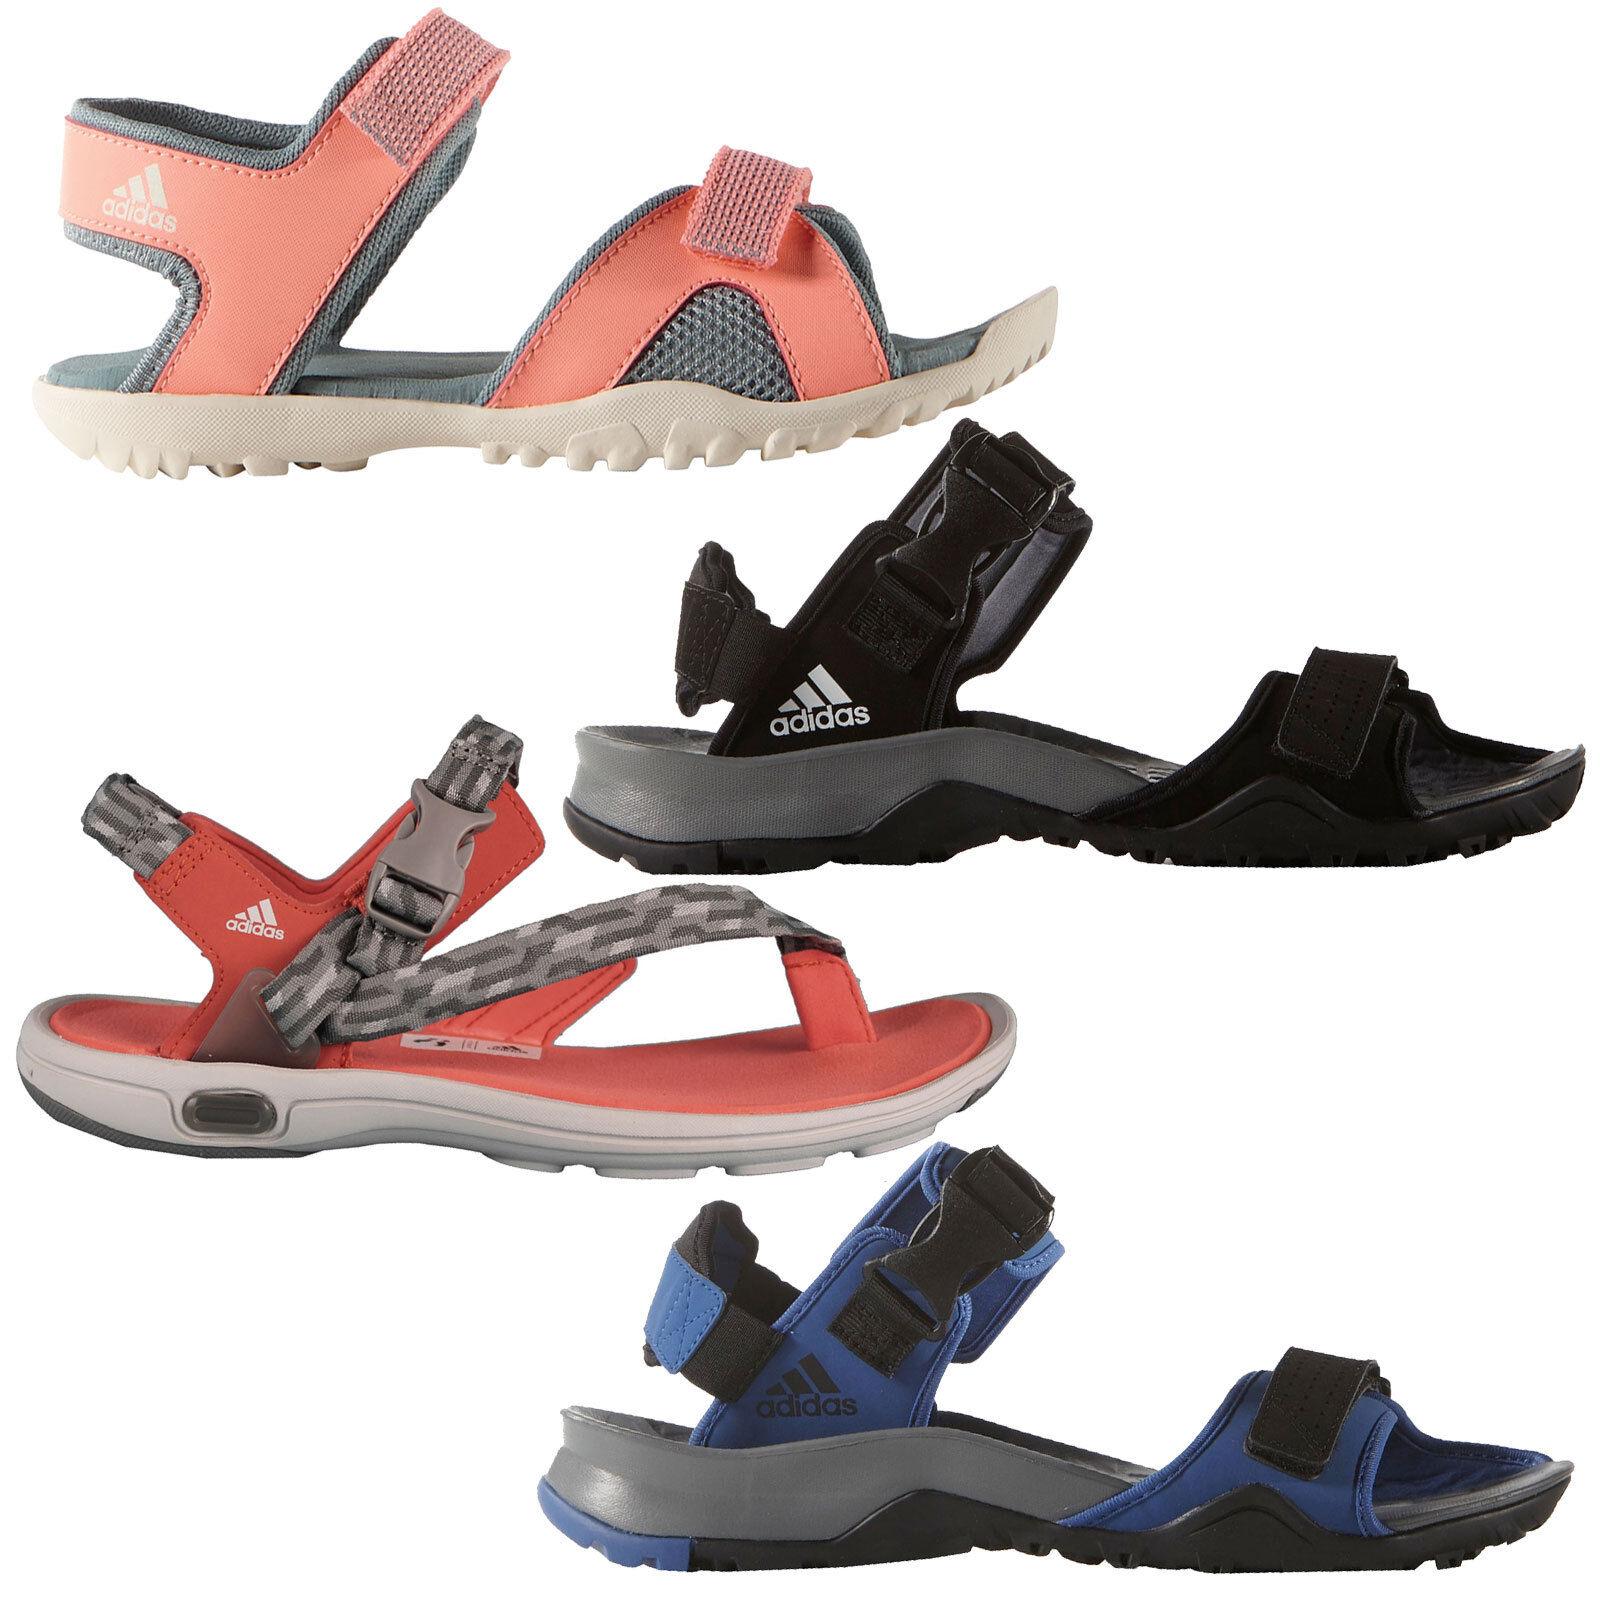 Adidas Performance Libria Cyprex Sandplay Trekking Sandals Outdoor shoes